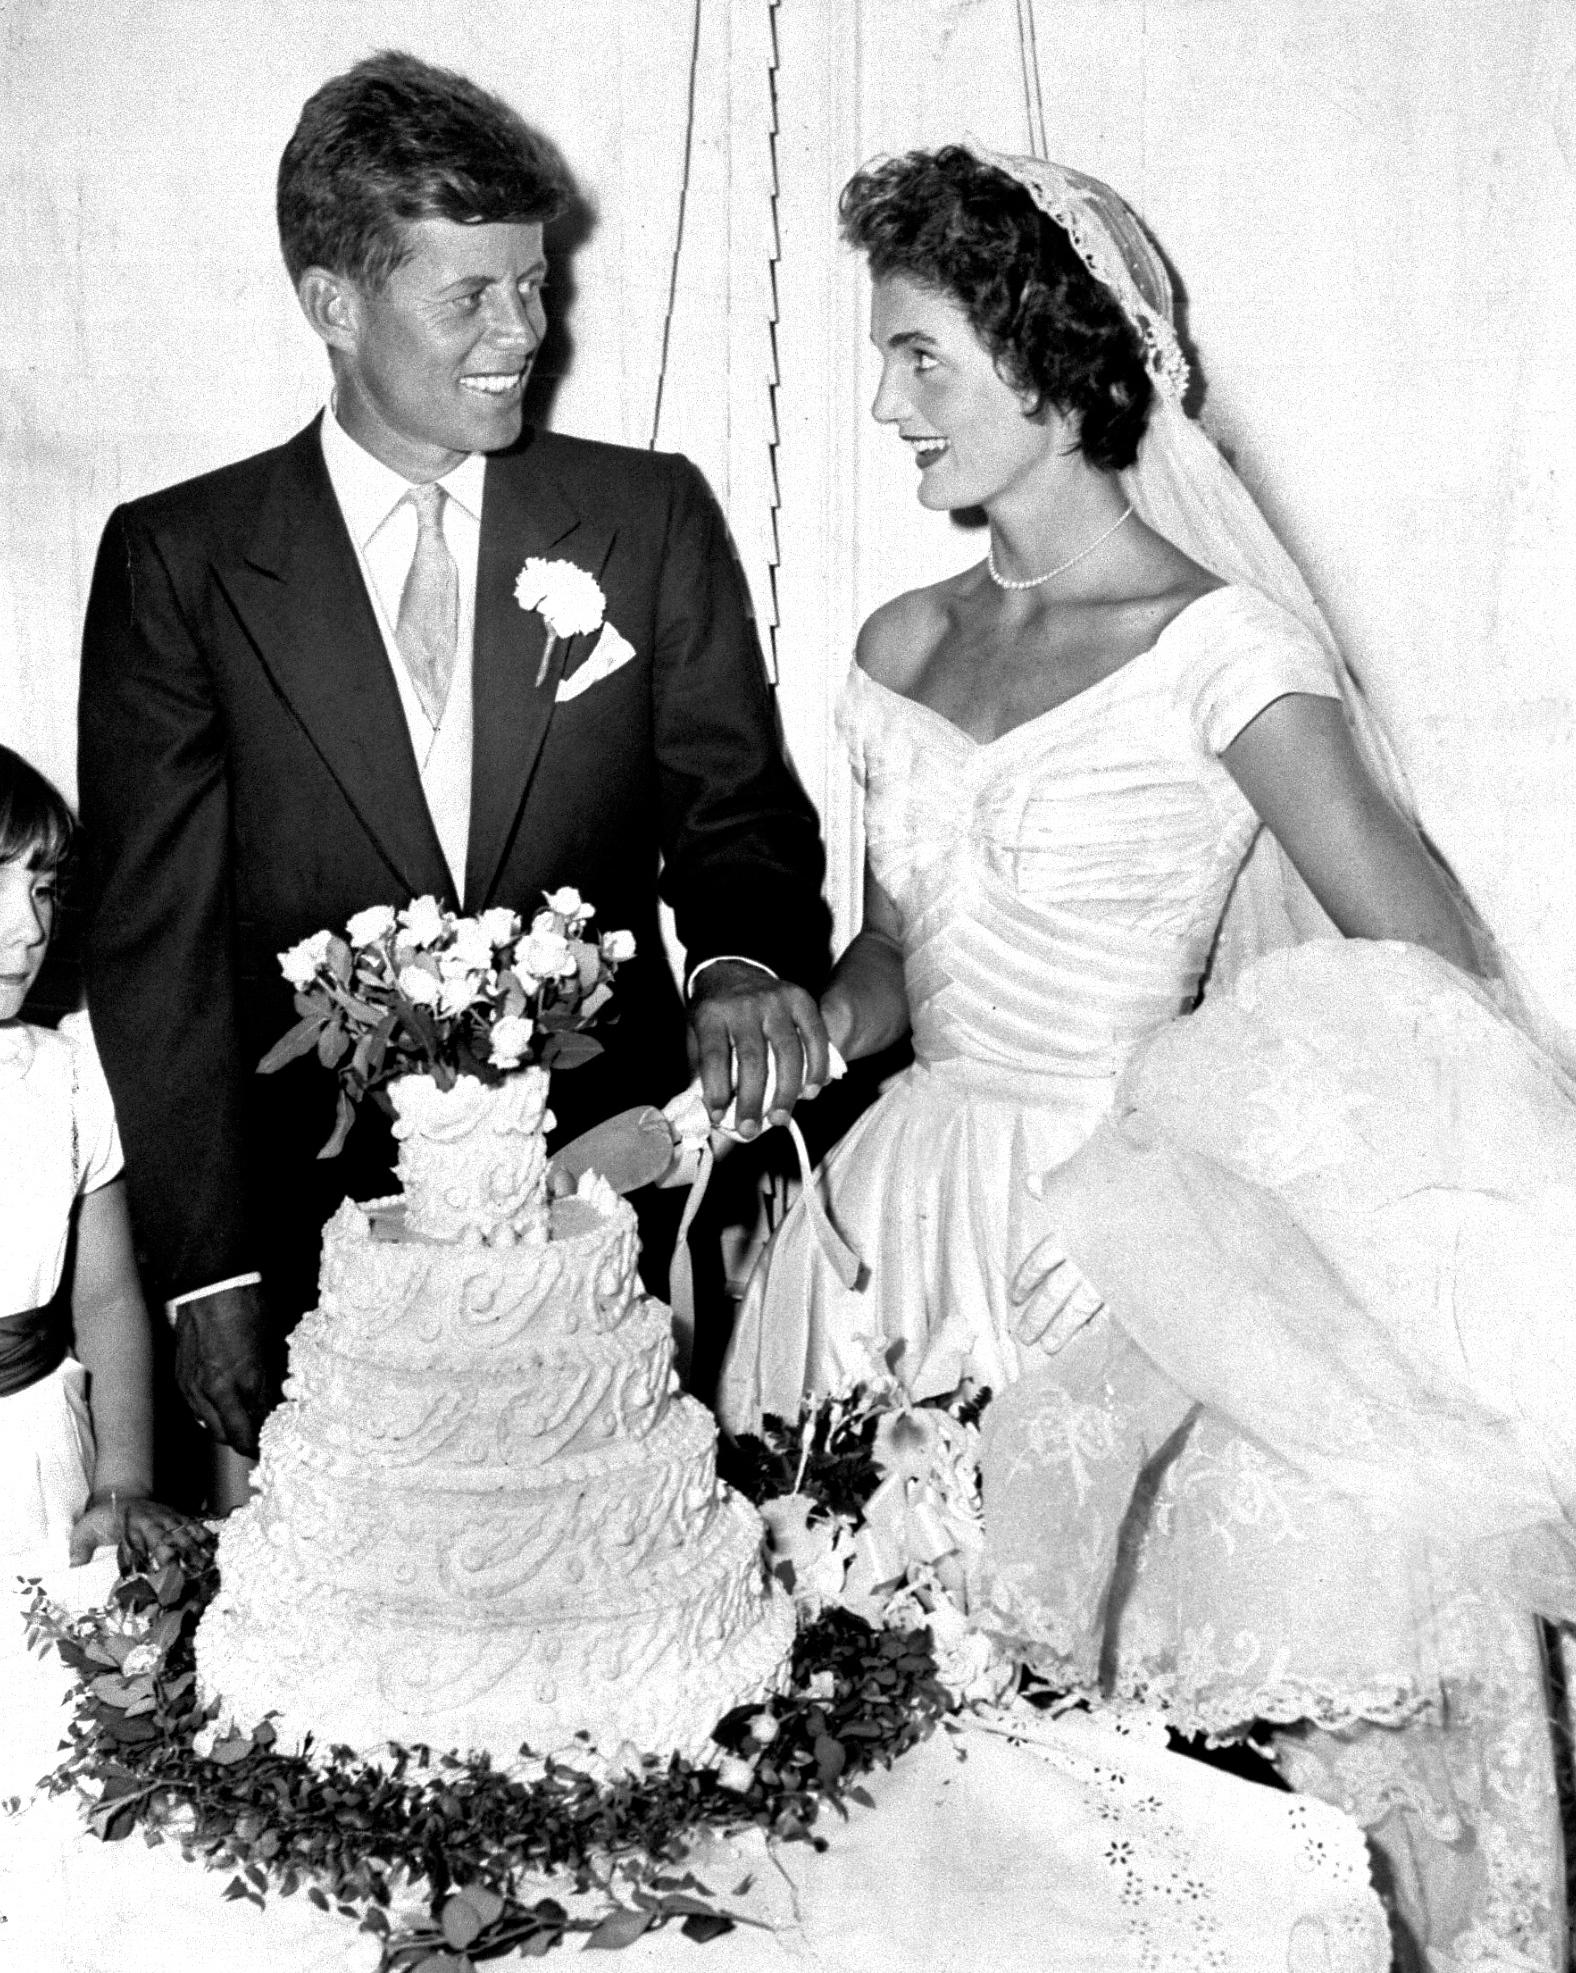 celebrity-vintage-wedding-cakes-jfk-jackie-kennedy-97347154-1015.jpg